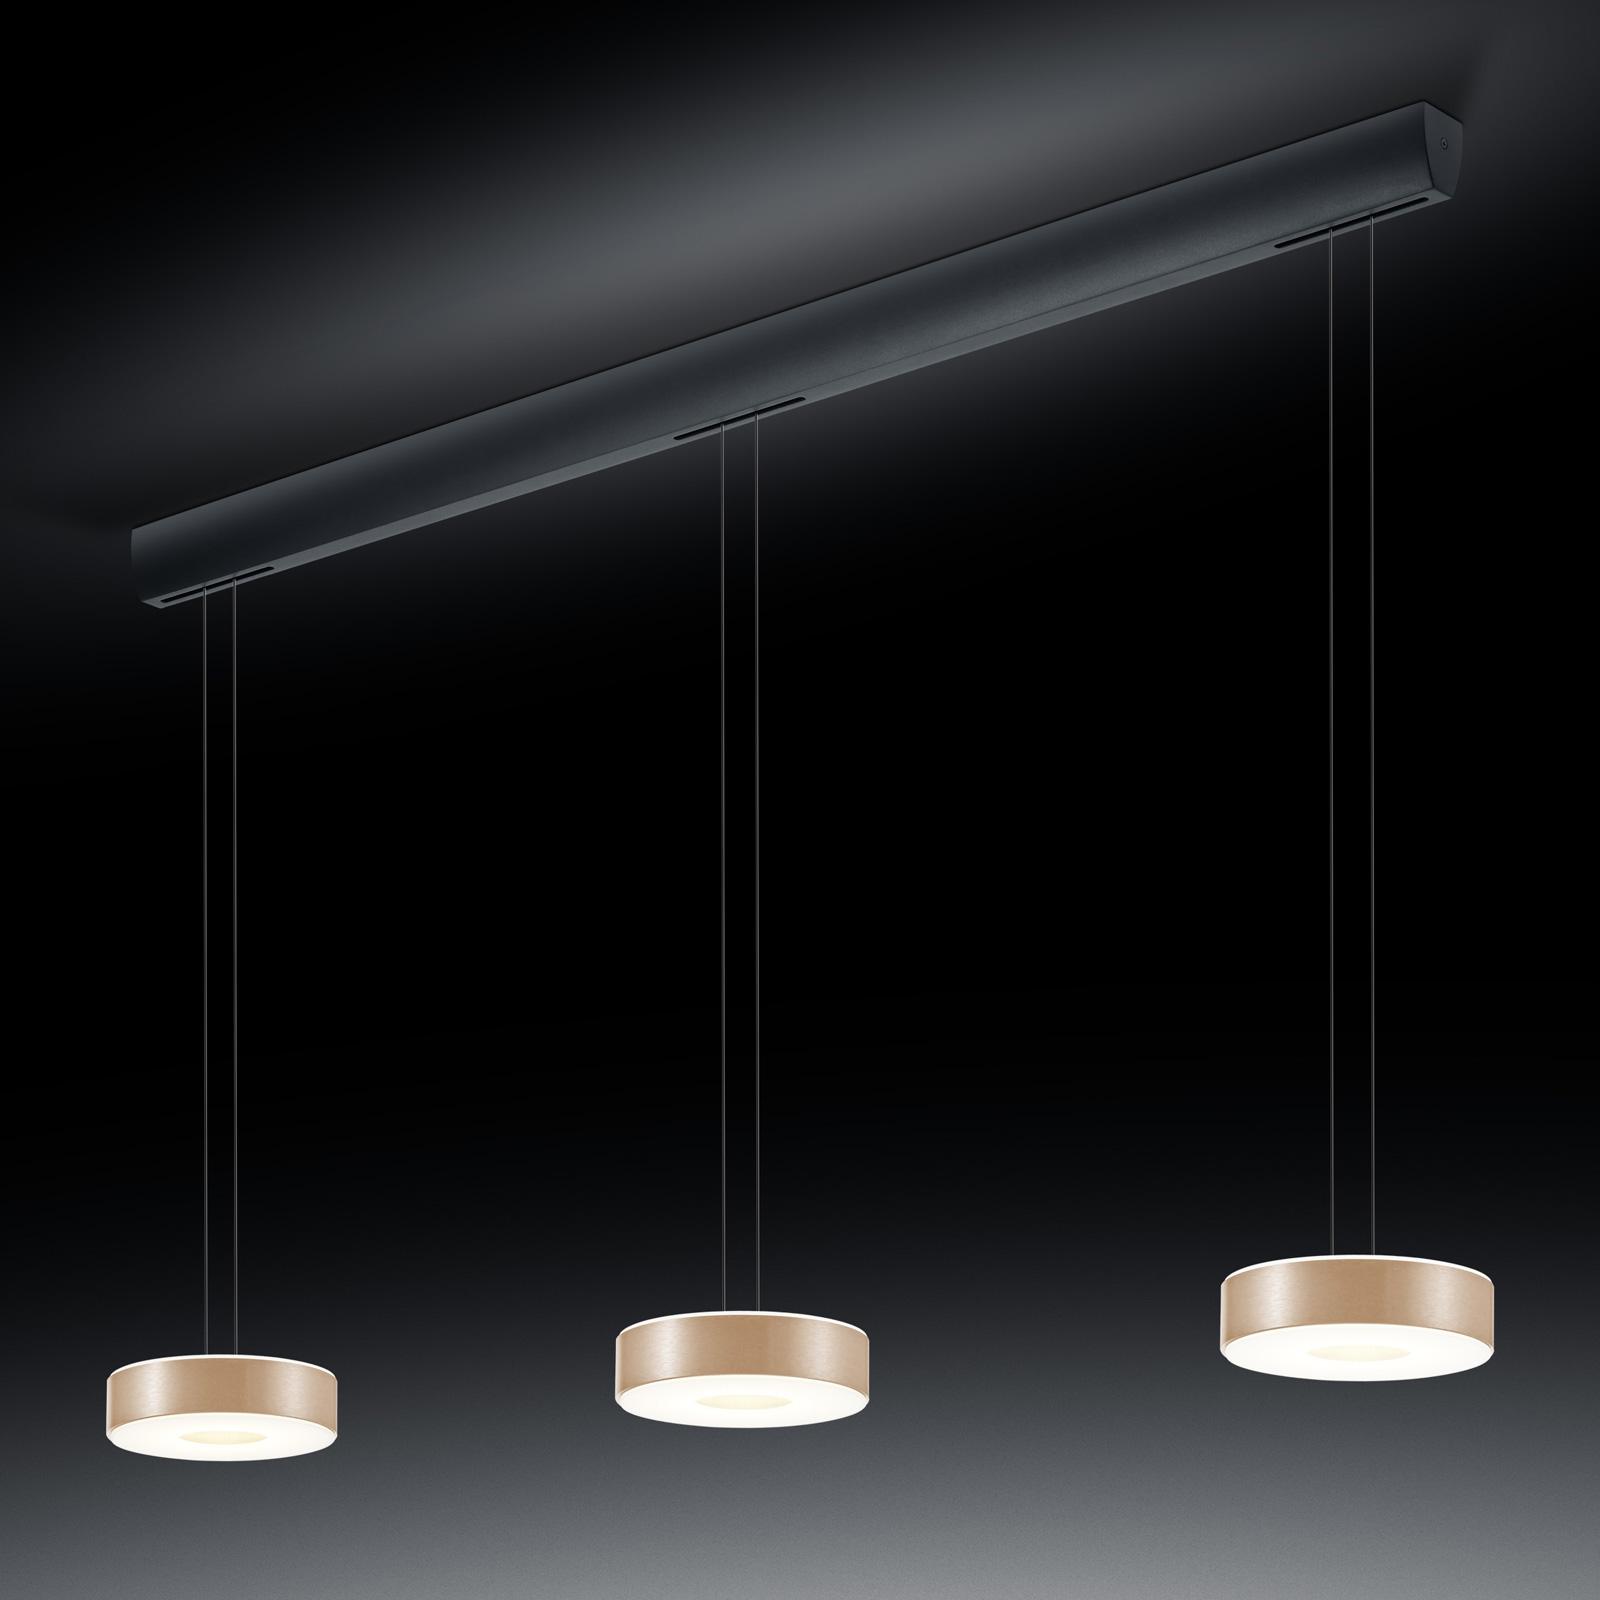 BANKAMP Tondo suspension LED à 3 lampes or rose